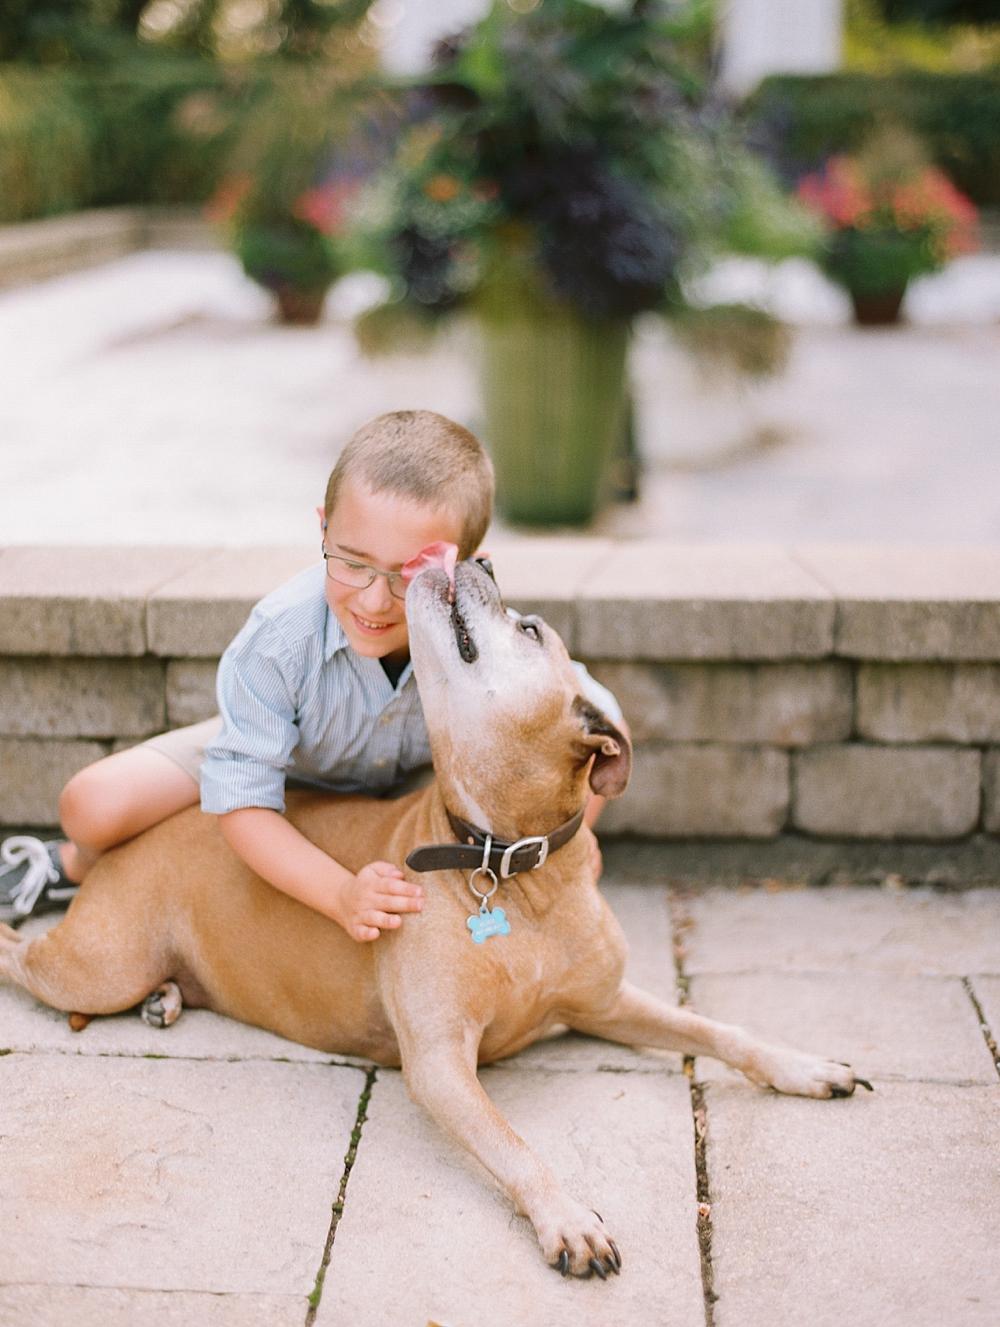 kristin-la-voie-photography-lifestyle-chicago-dog-6